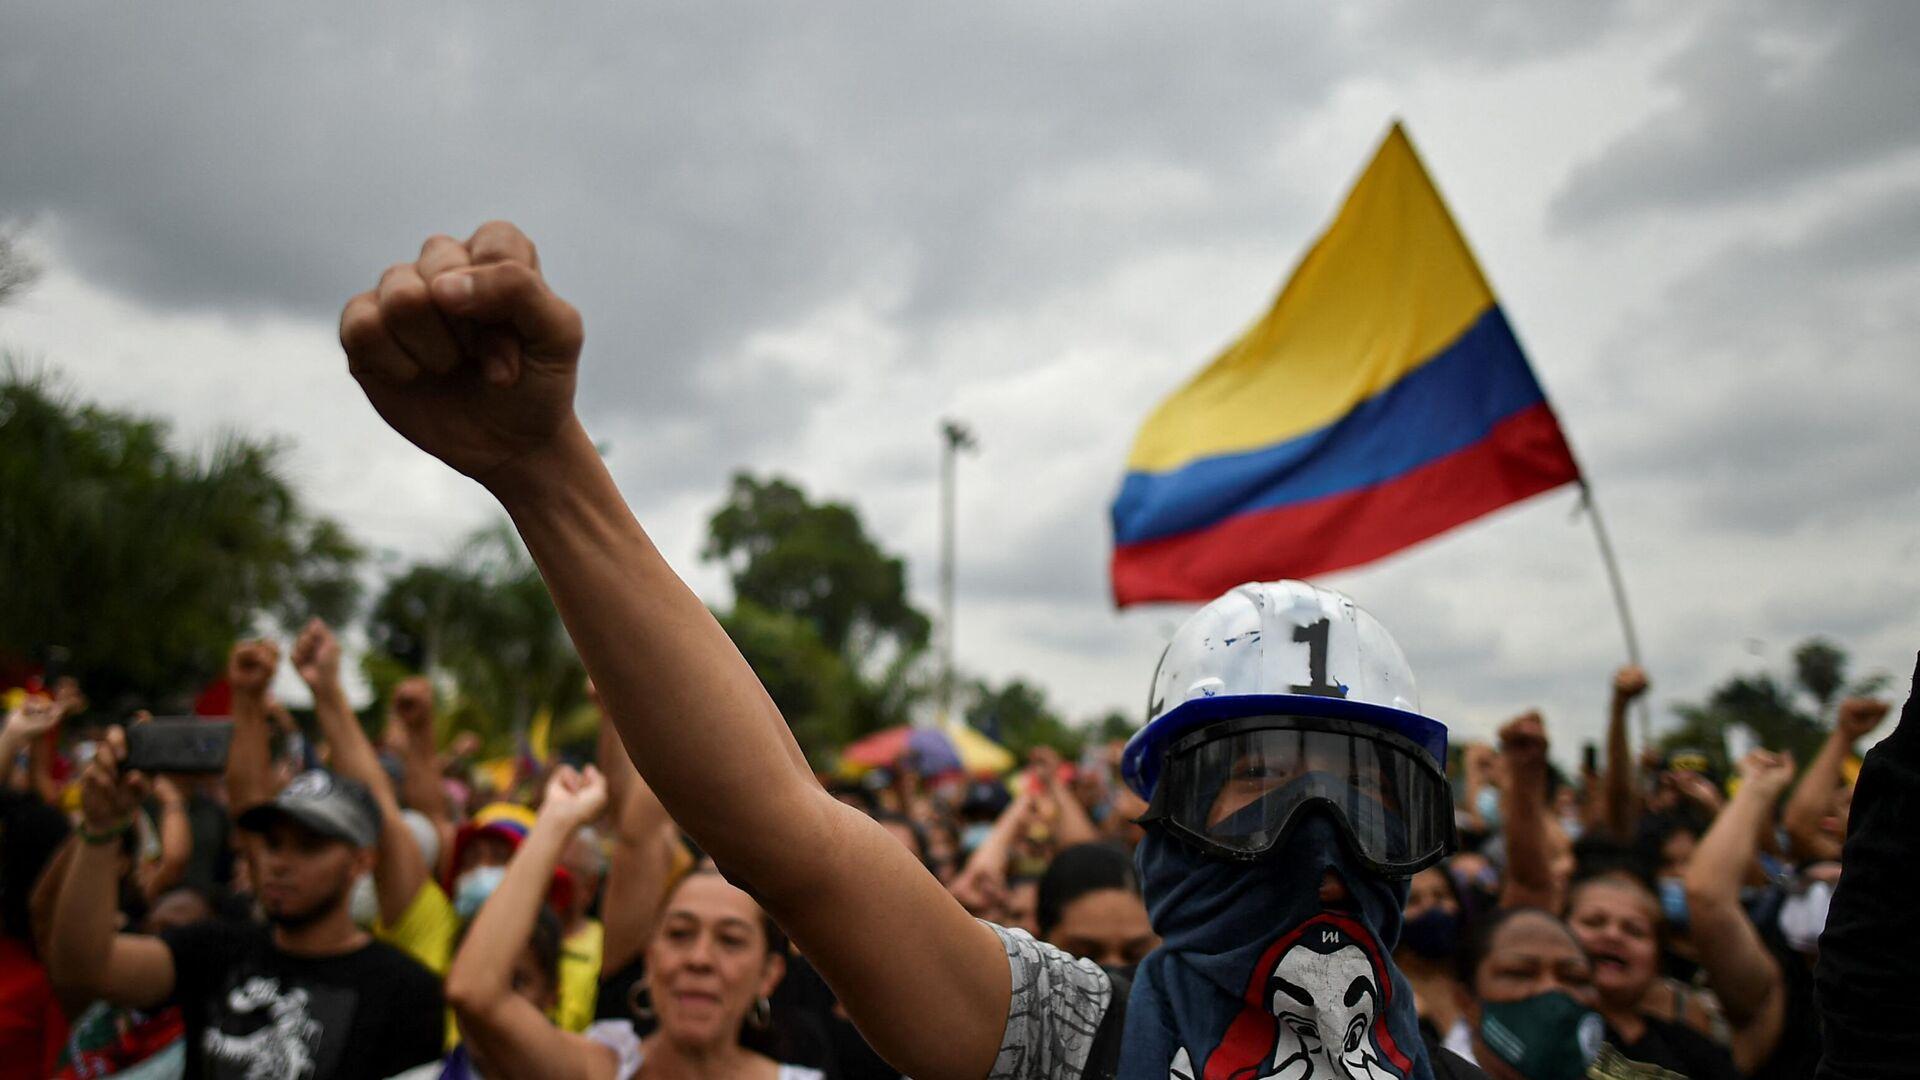 Protestas en Cali, Colombia - Sputnik Mundo, 1920, 09.09.2021